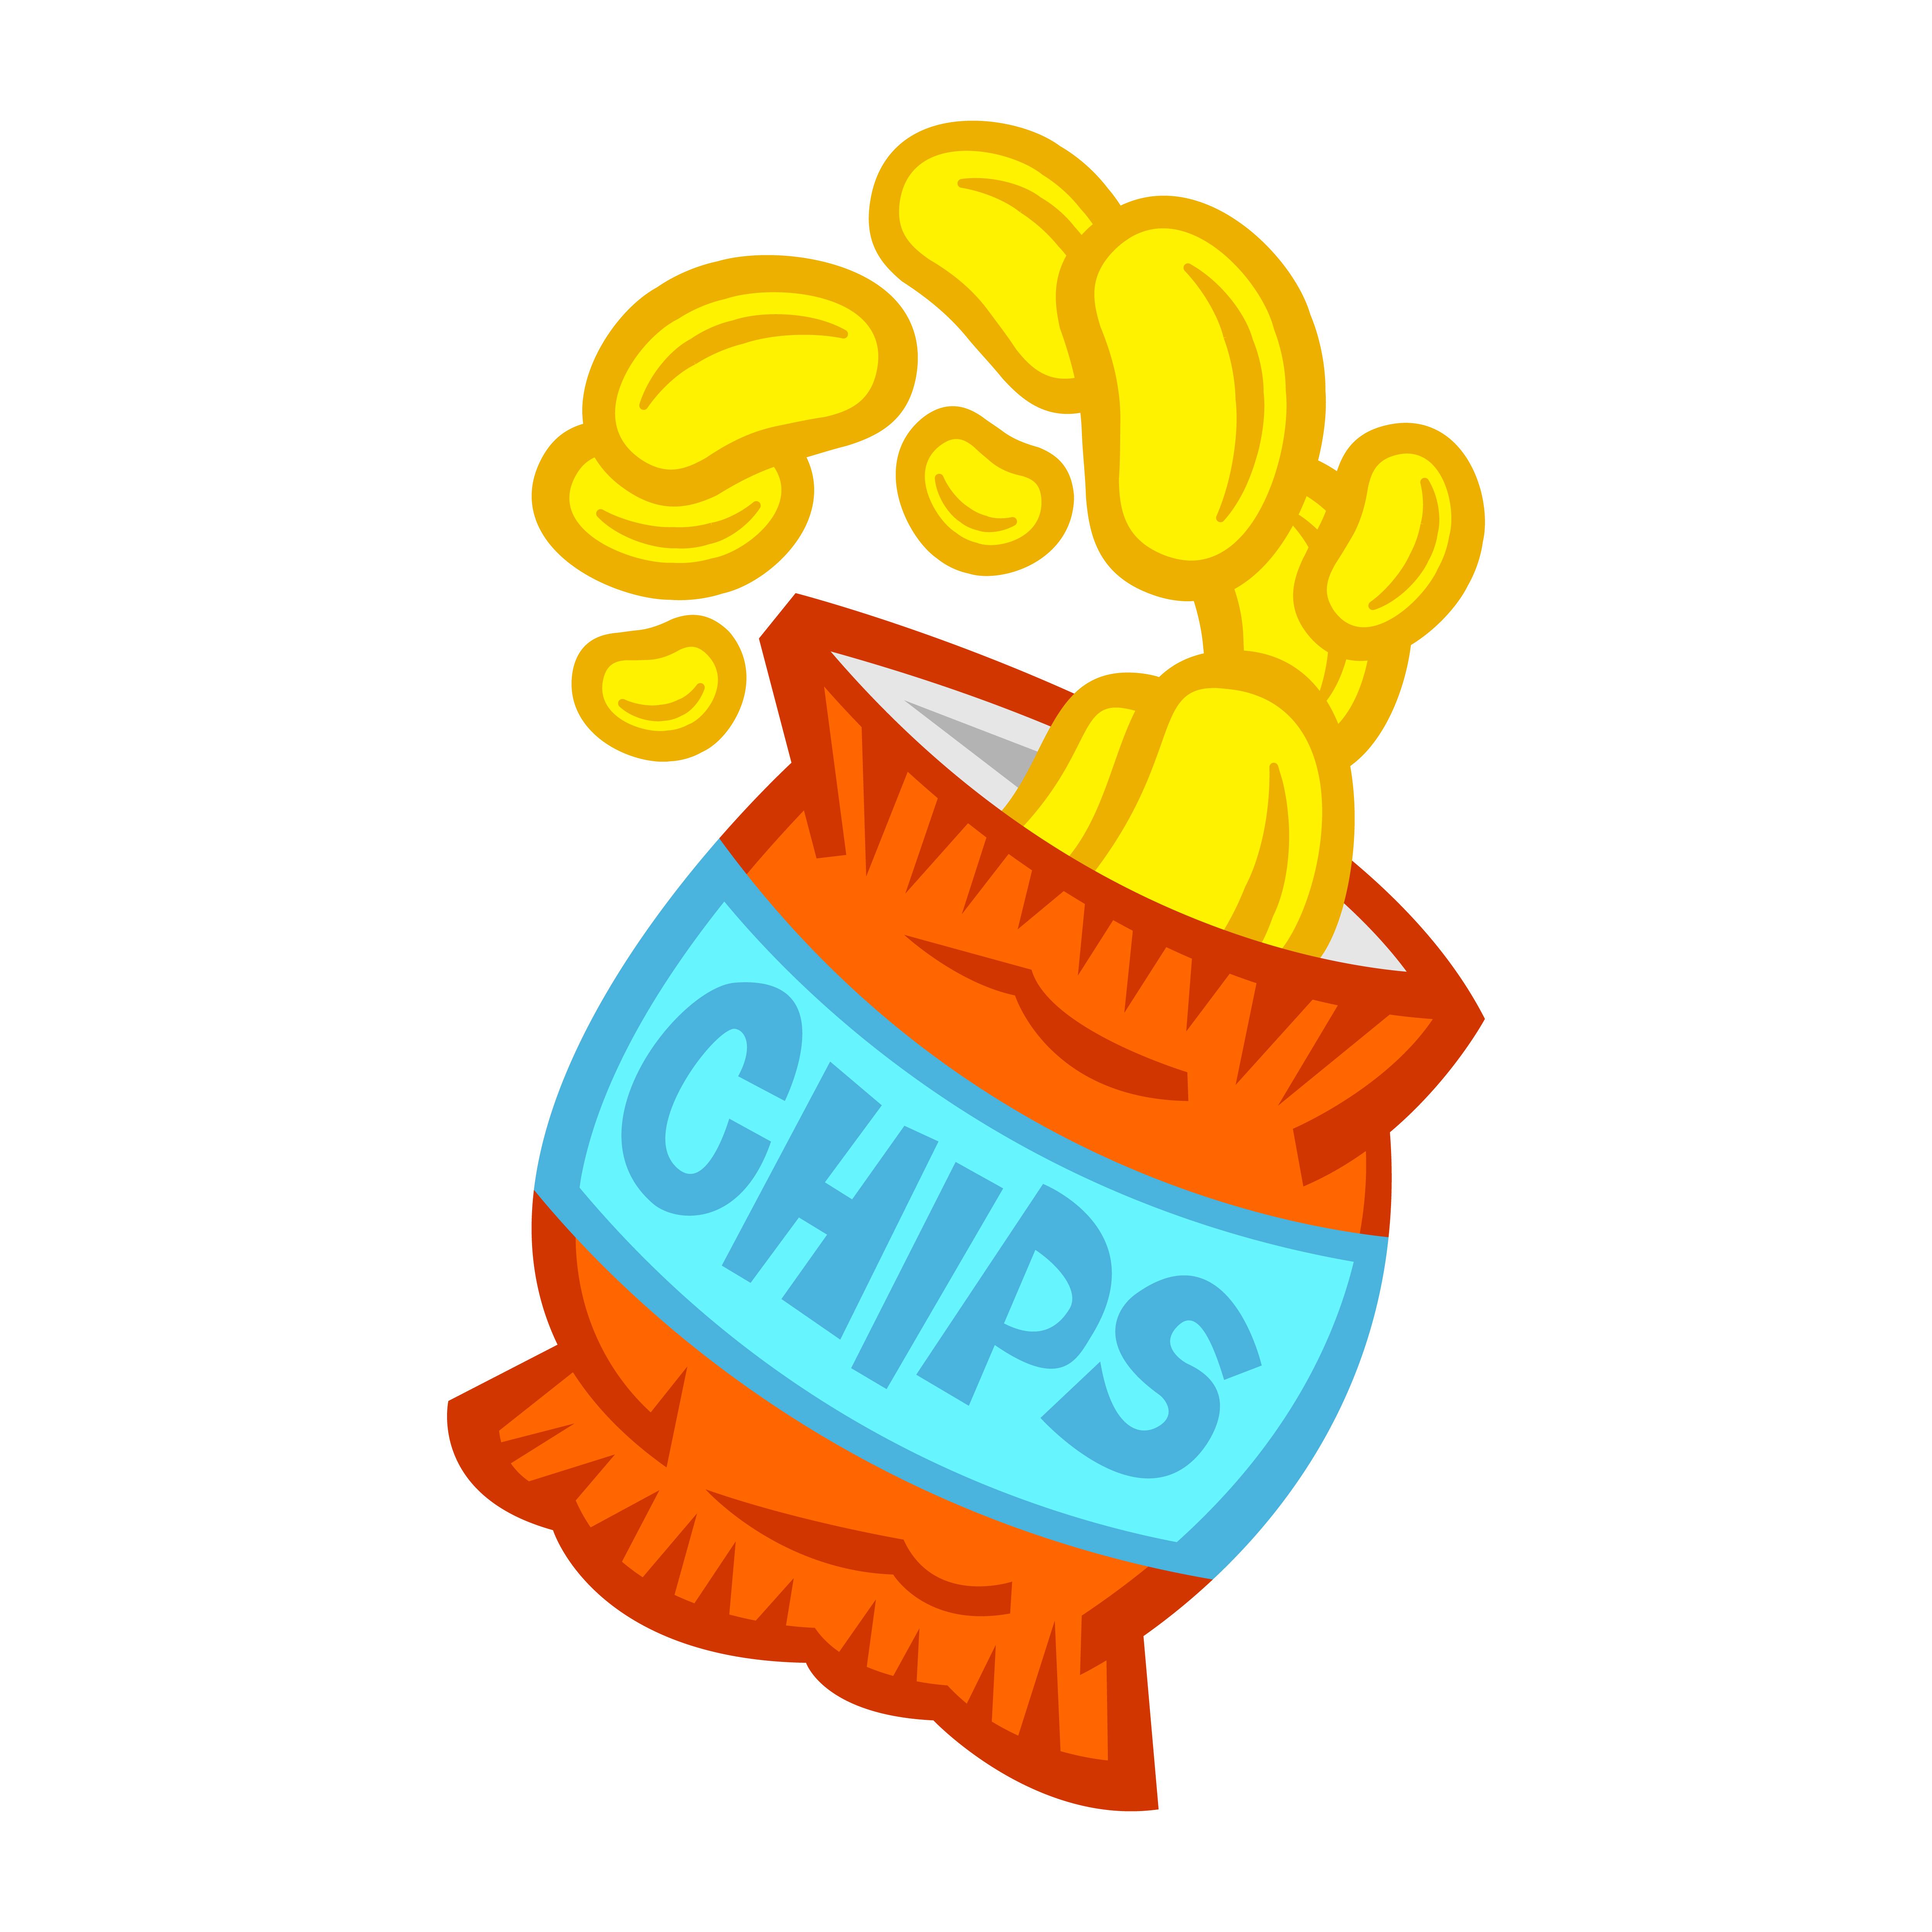 Potato Chips Bag Free Vector Art.